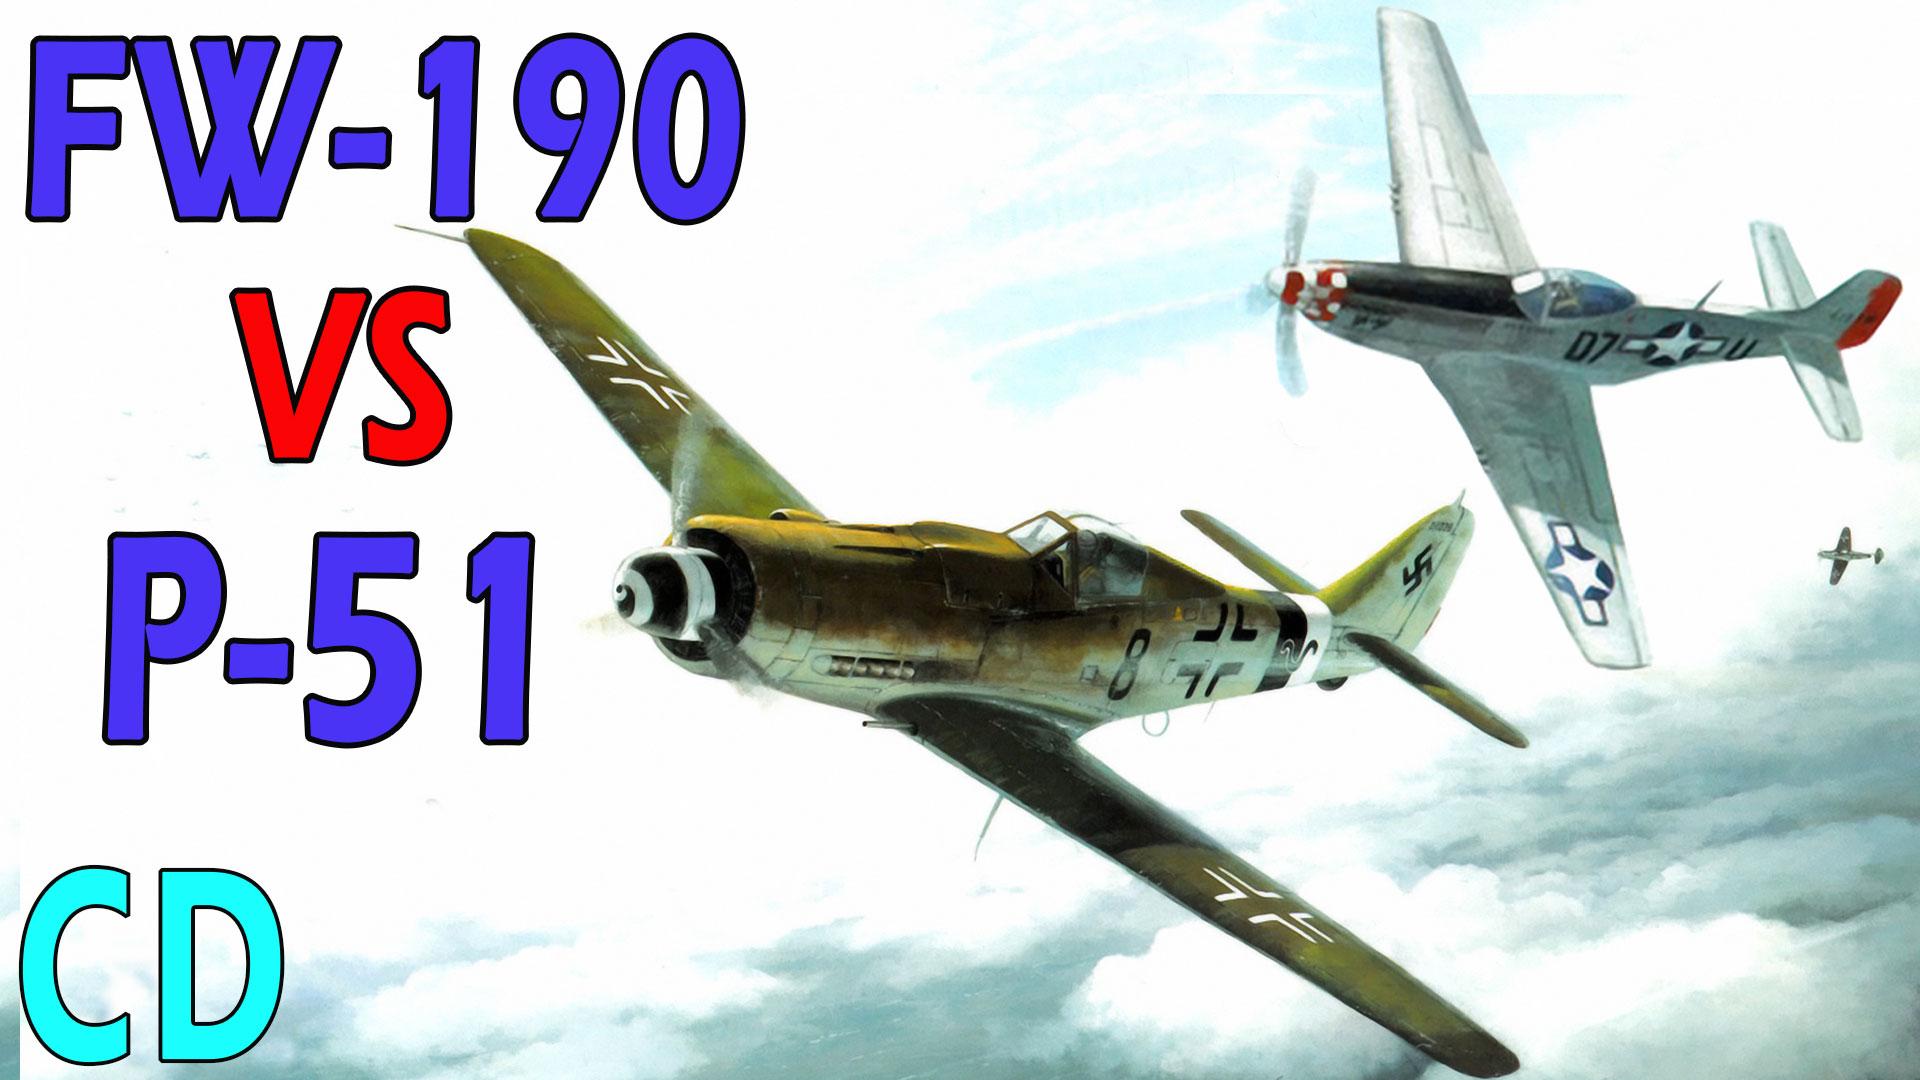 P-51 vs FW-190